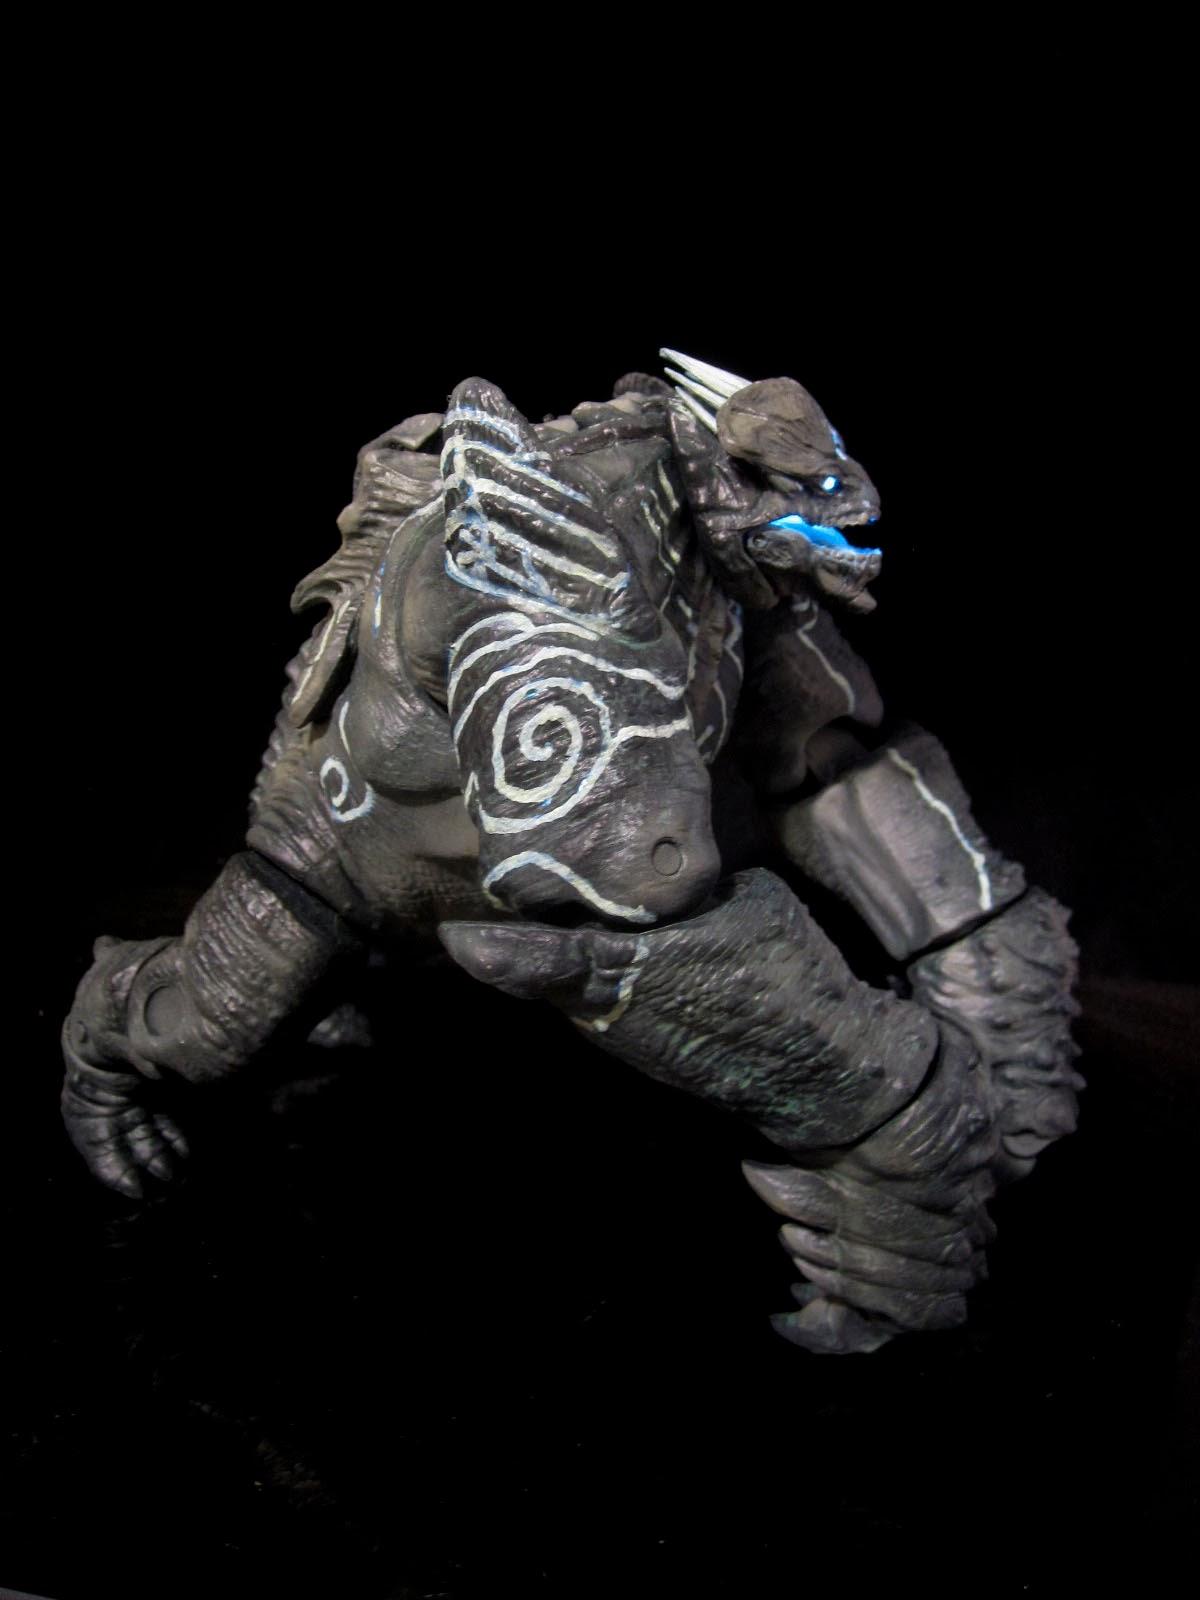 Pacific Rim Leatherback Kaiju neca custom light up action ...